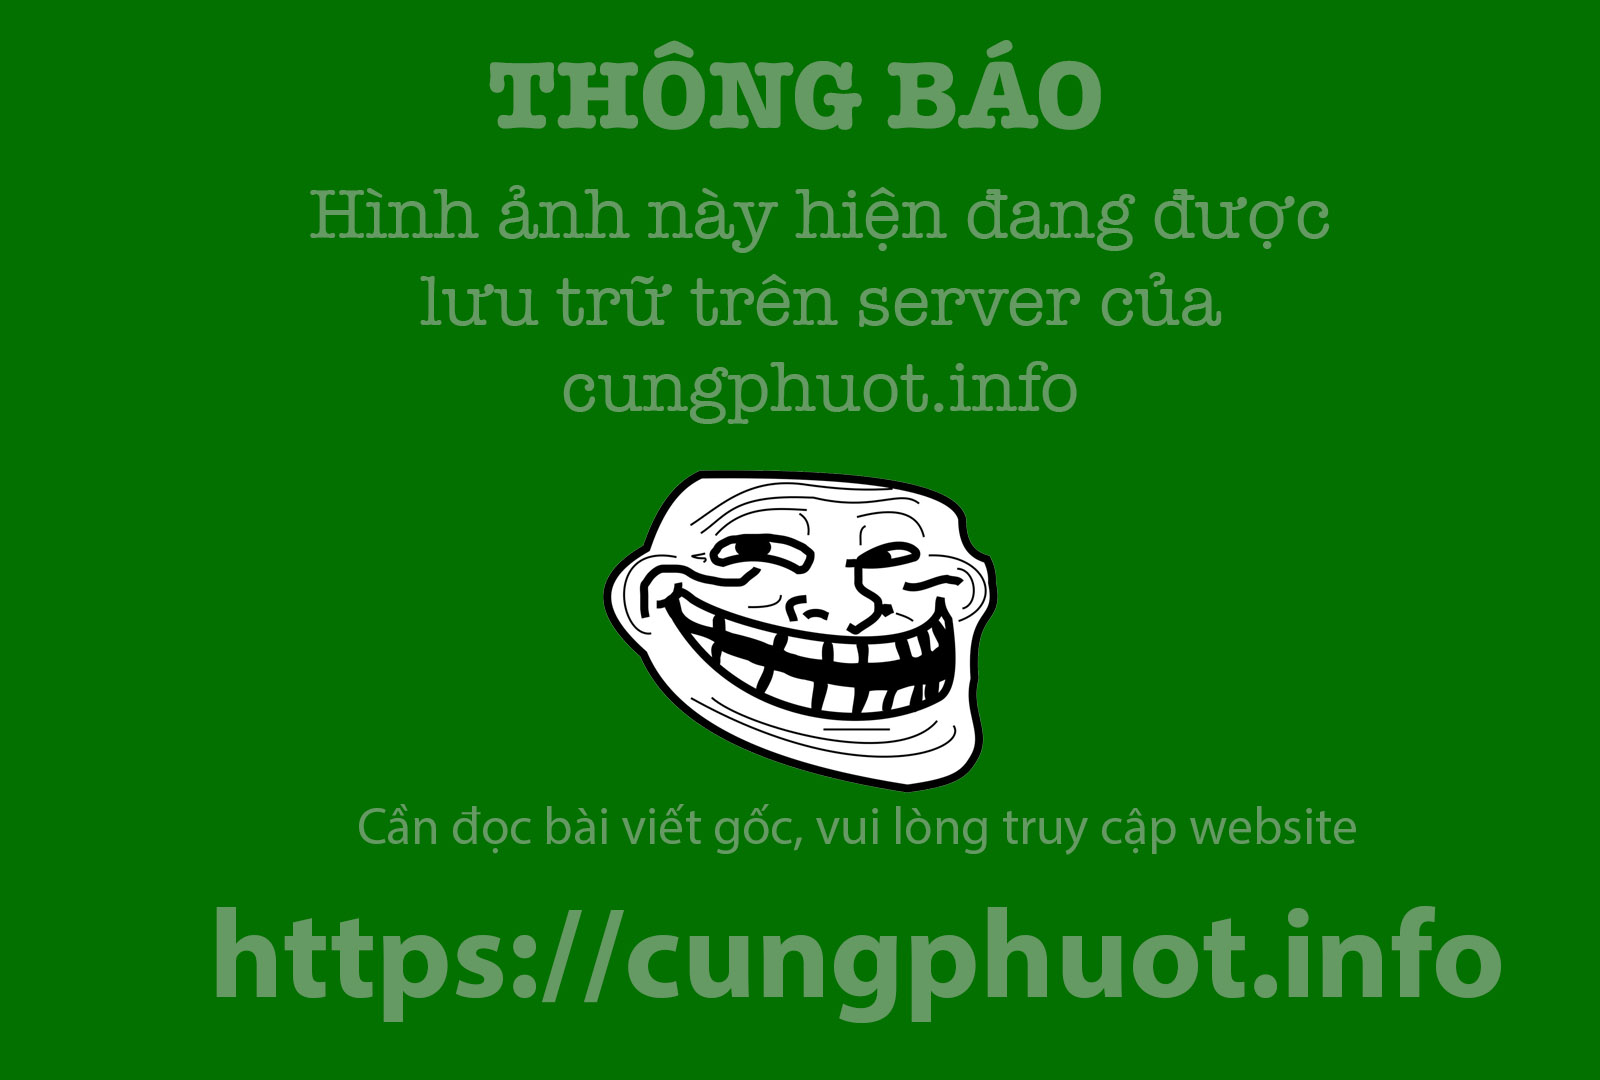 Co do Hue dep la trong suong mu hinh anh 8